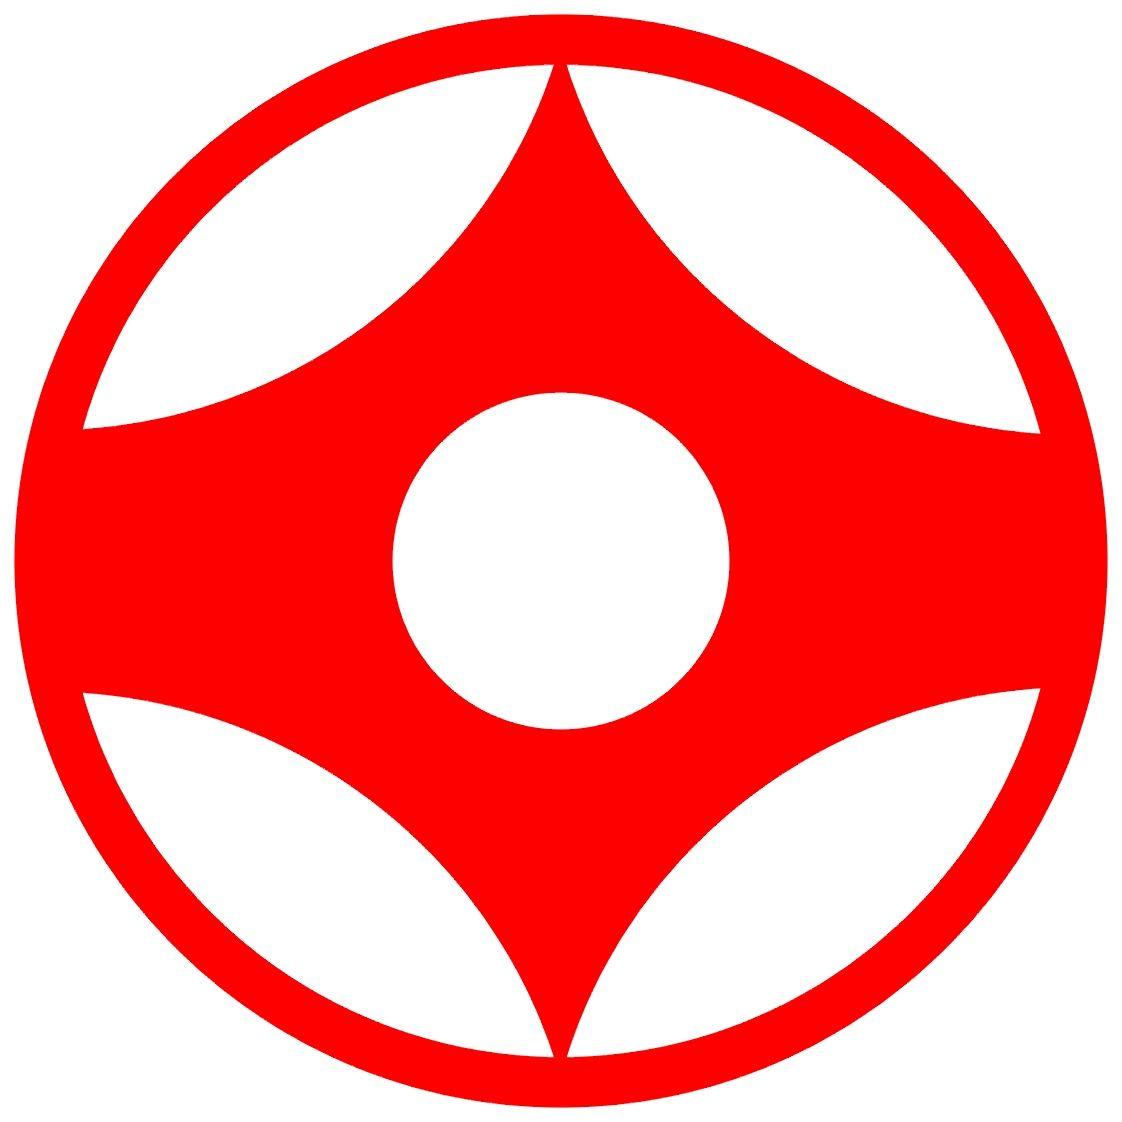 Karate symbols